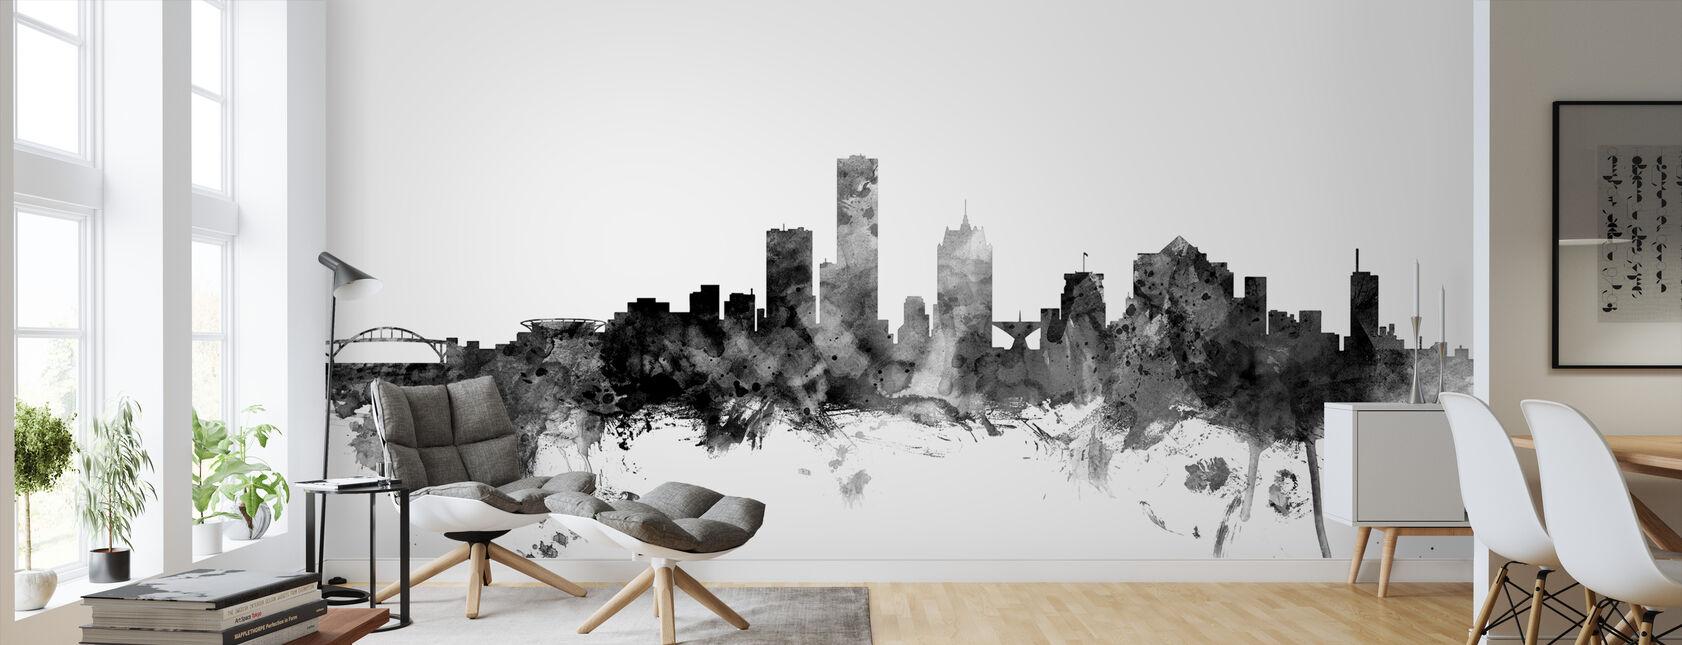 Milwaukee Wisconsin Skyline Black - Wallpaper - Living Room